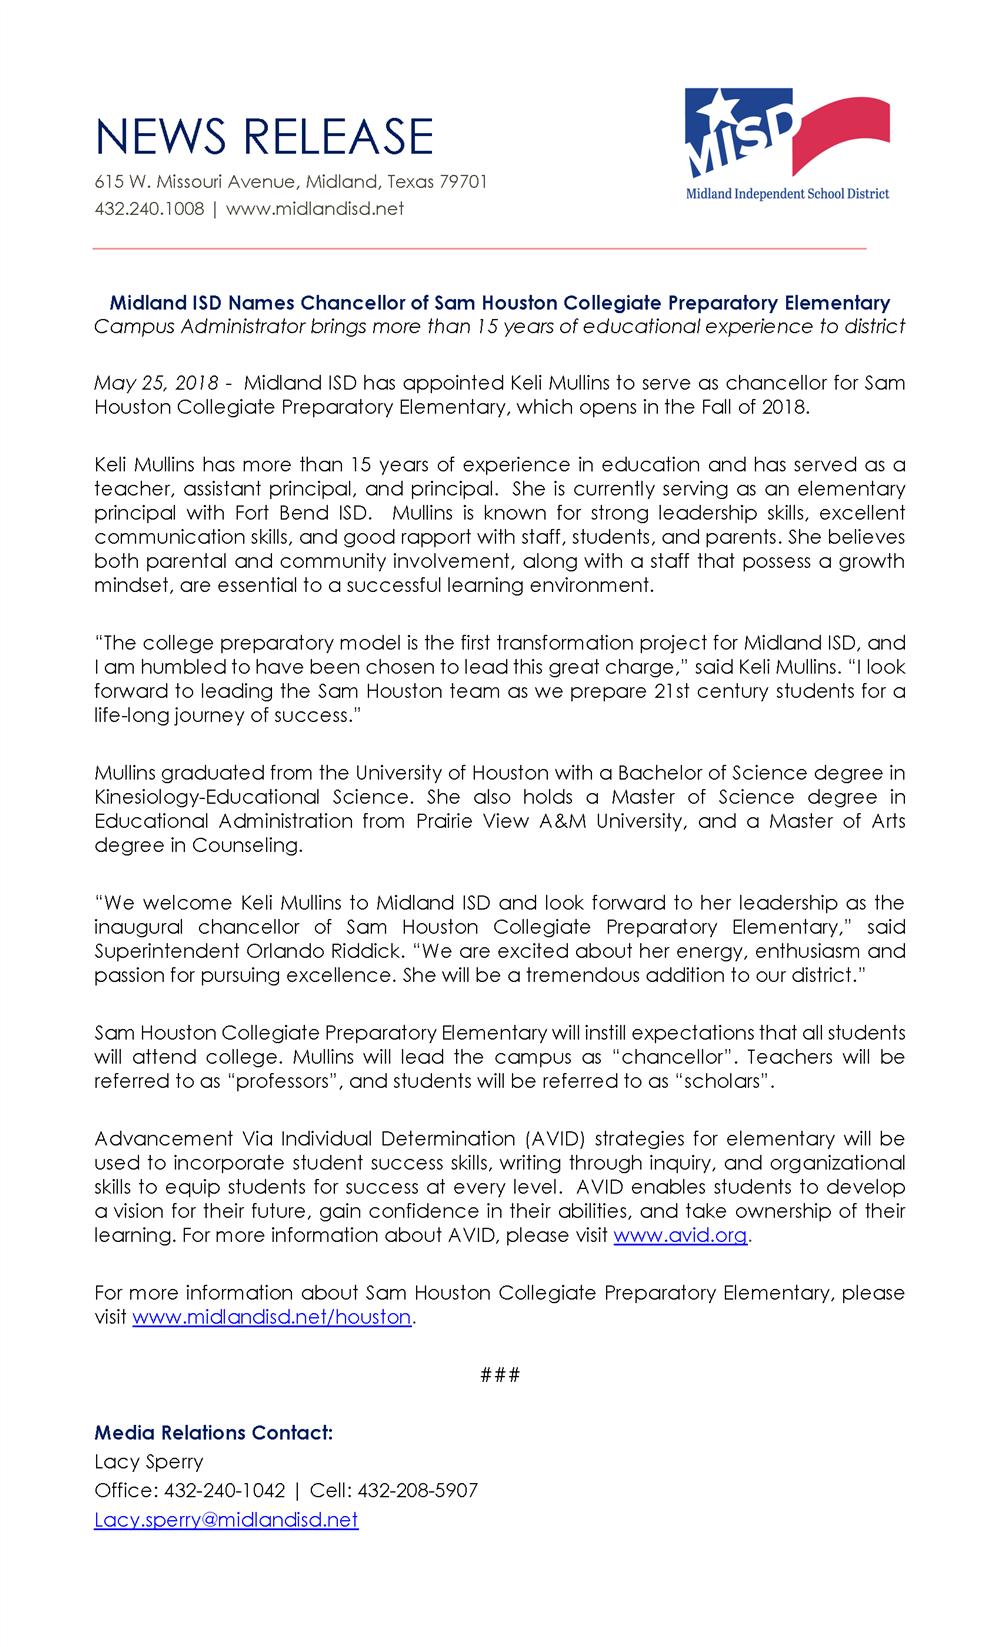 Midland ISD Names Chancellor of Sam Houston Collegiate